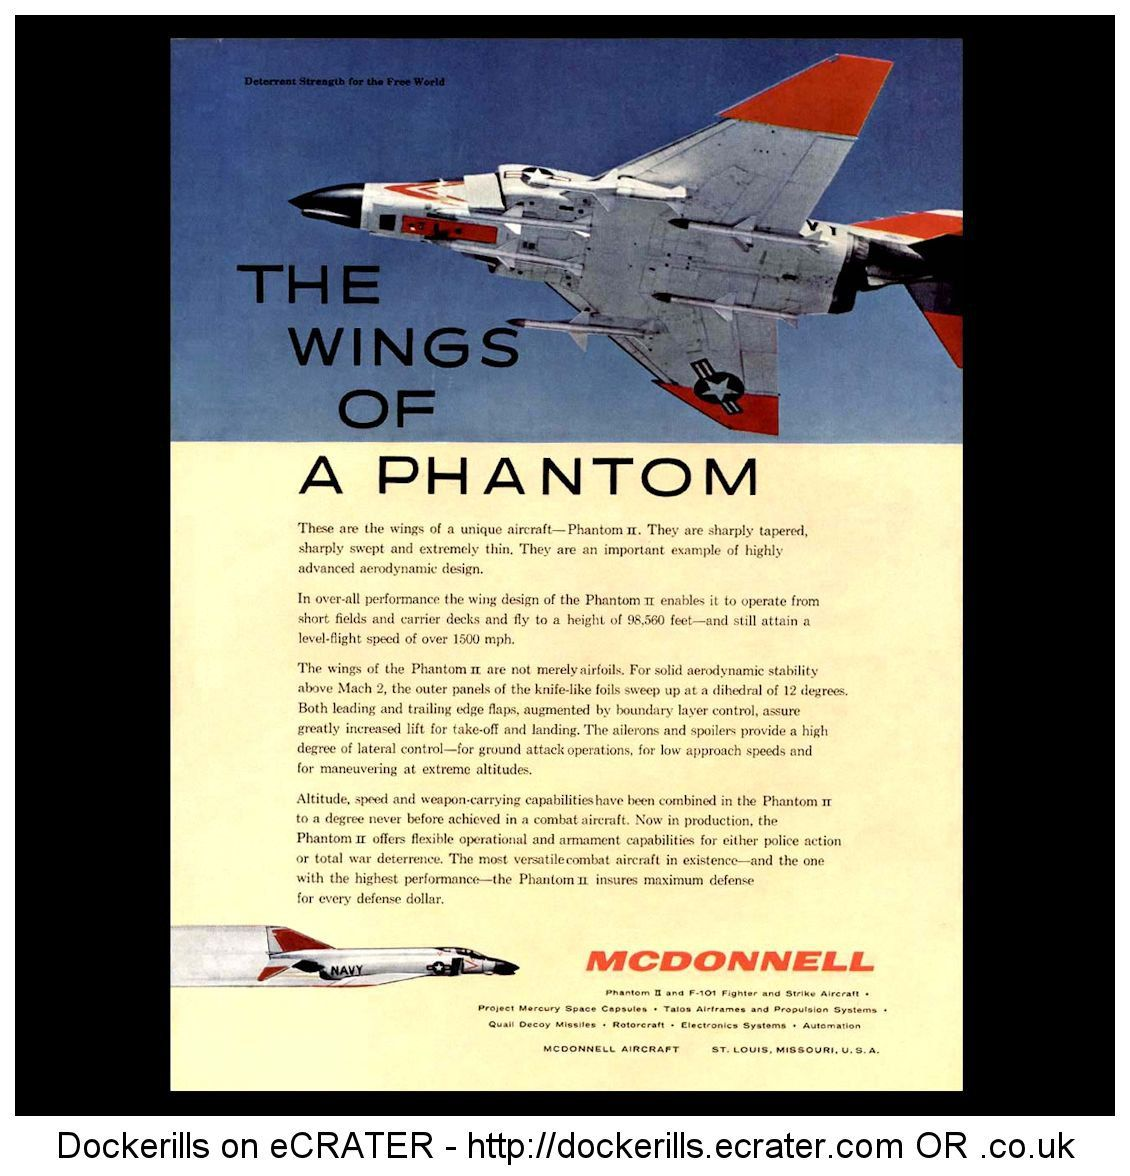 McDonnell Phantom II Advert - Wings Of A Phantom. From Interavia Magazine, 1961.